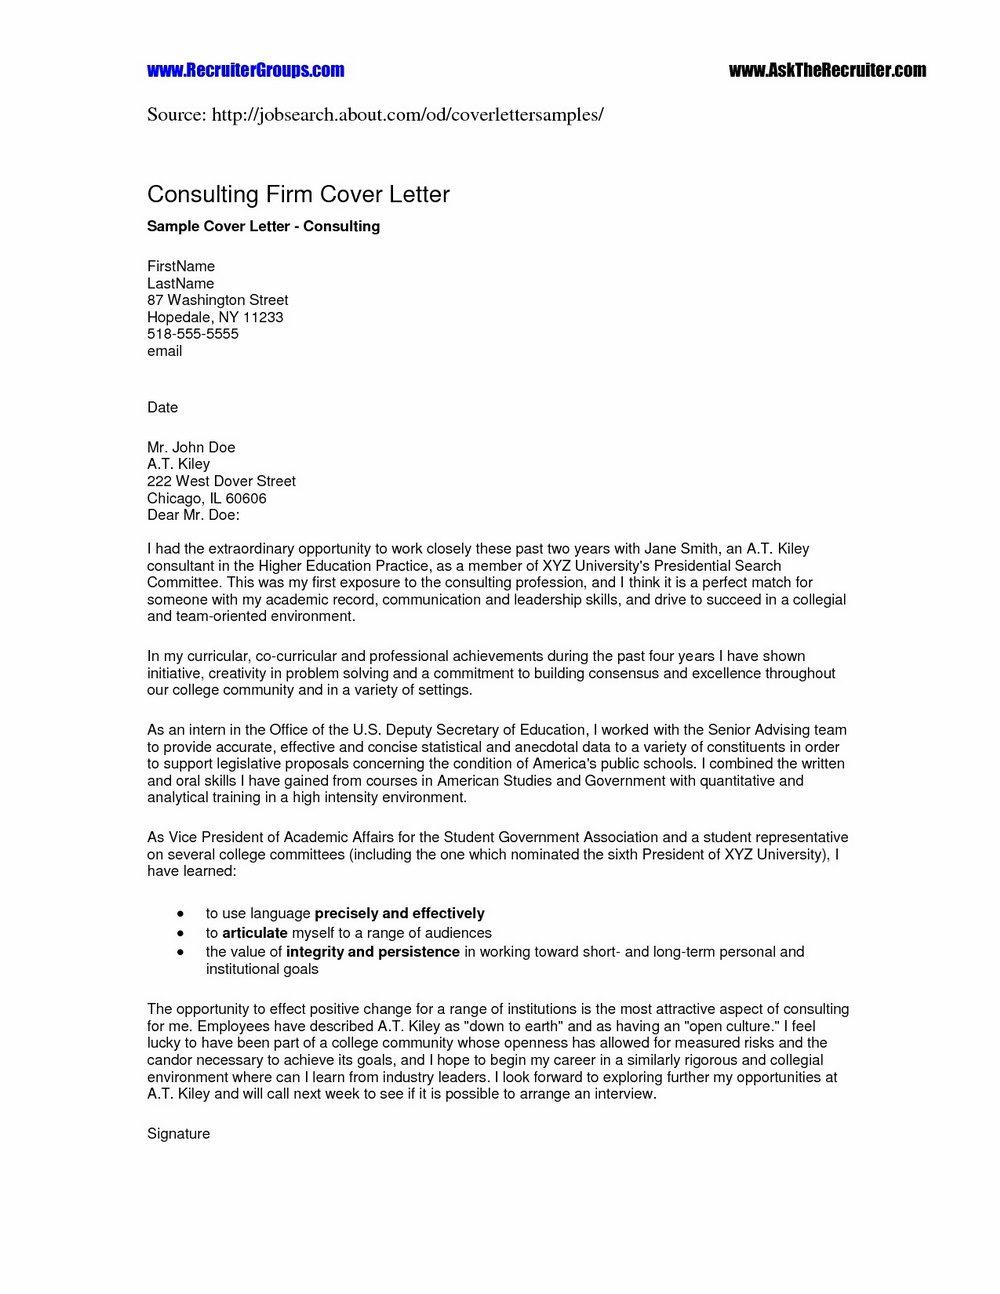 Free Resume Templates Microsoft Word 2003